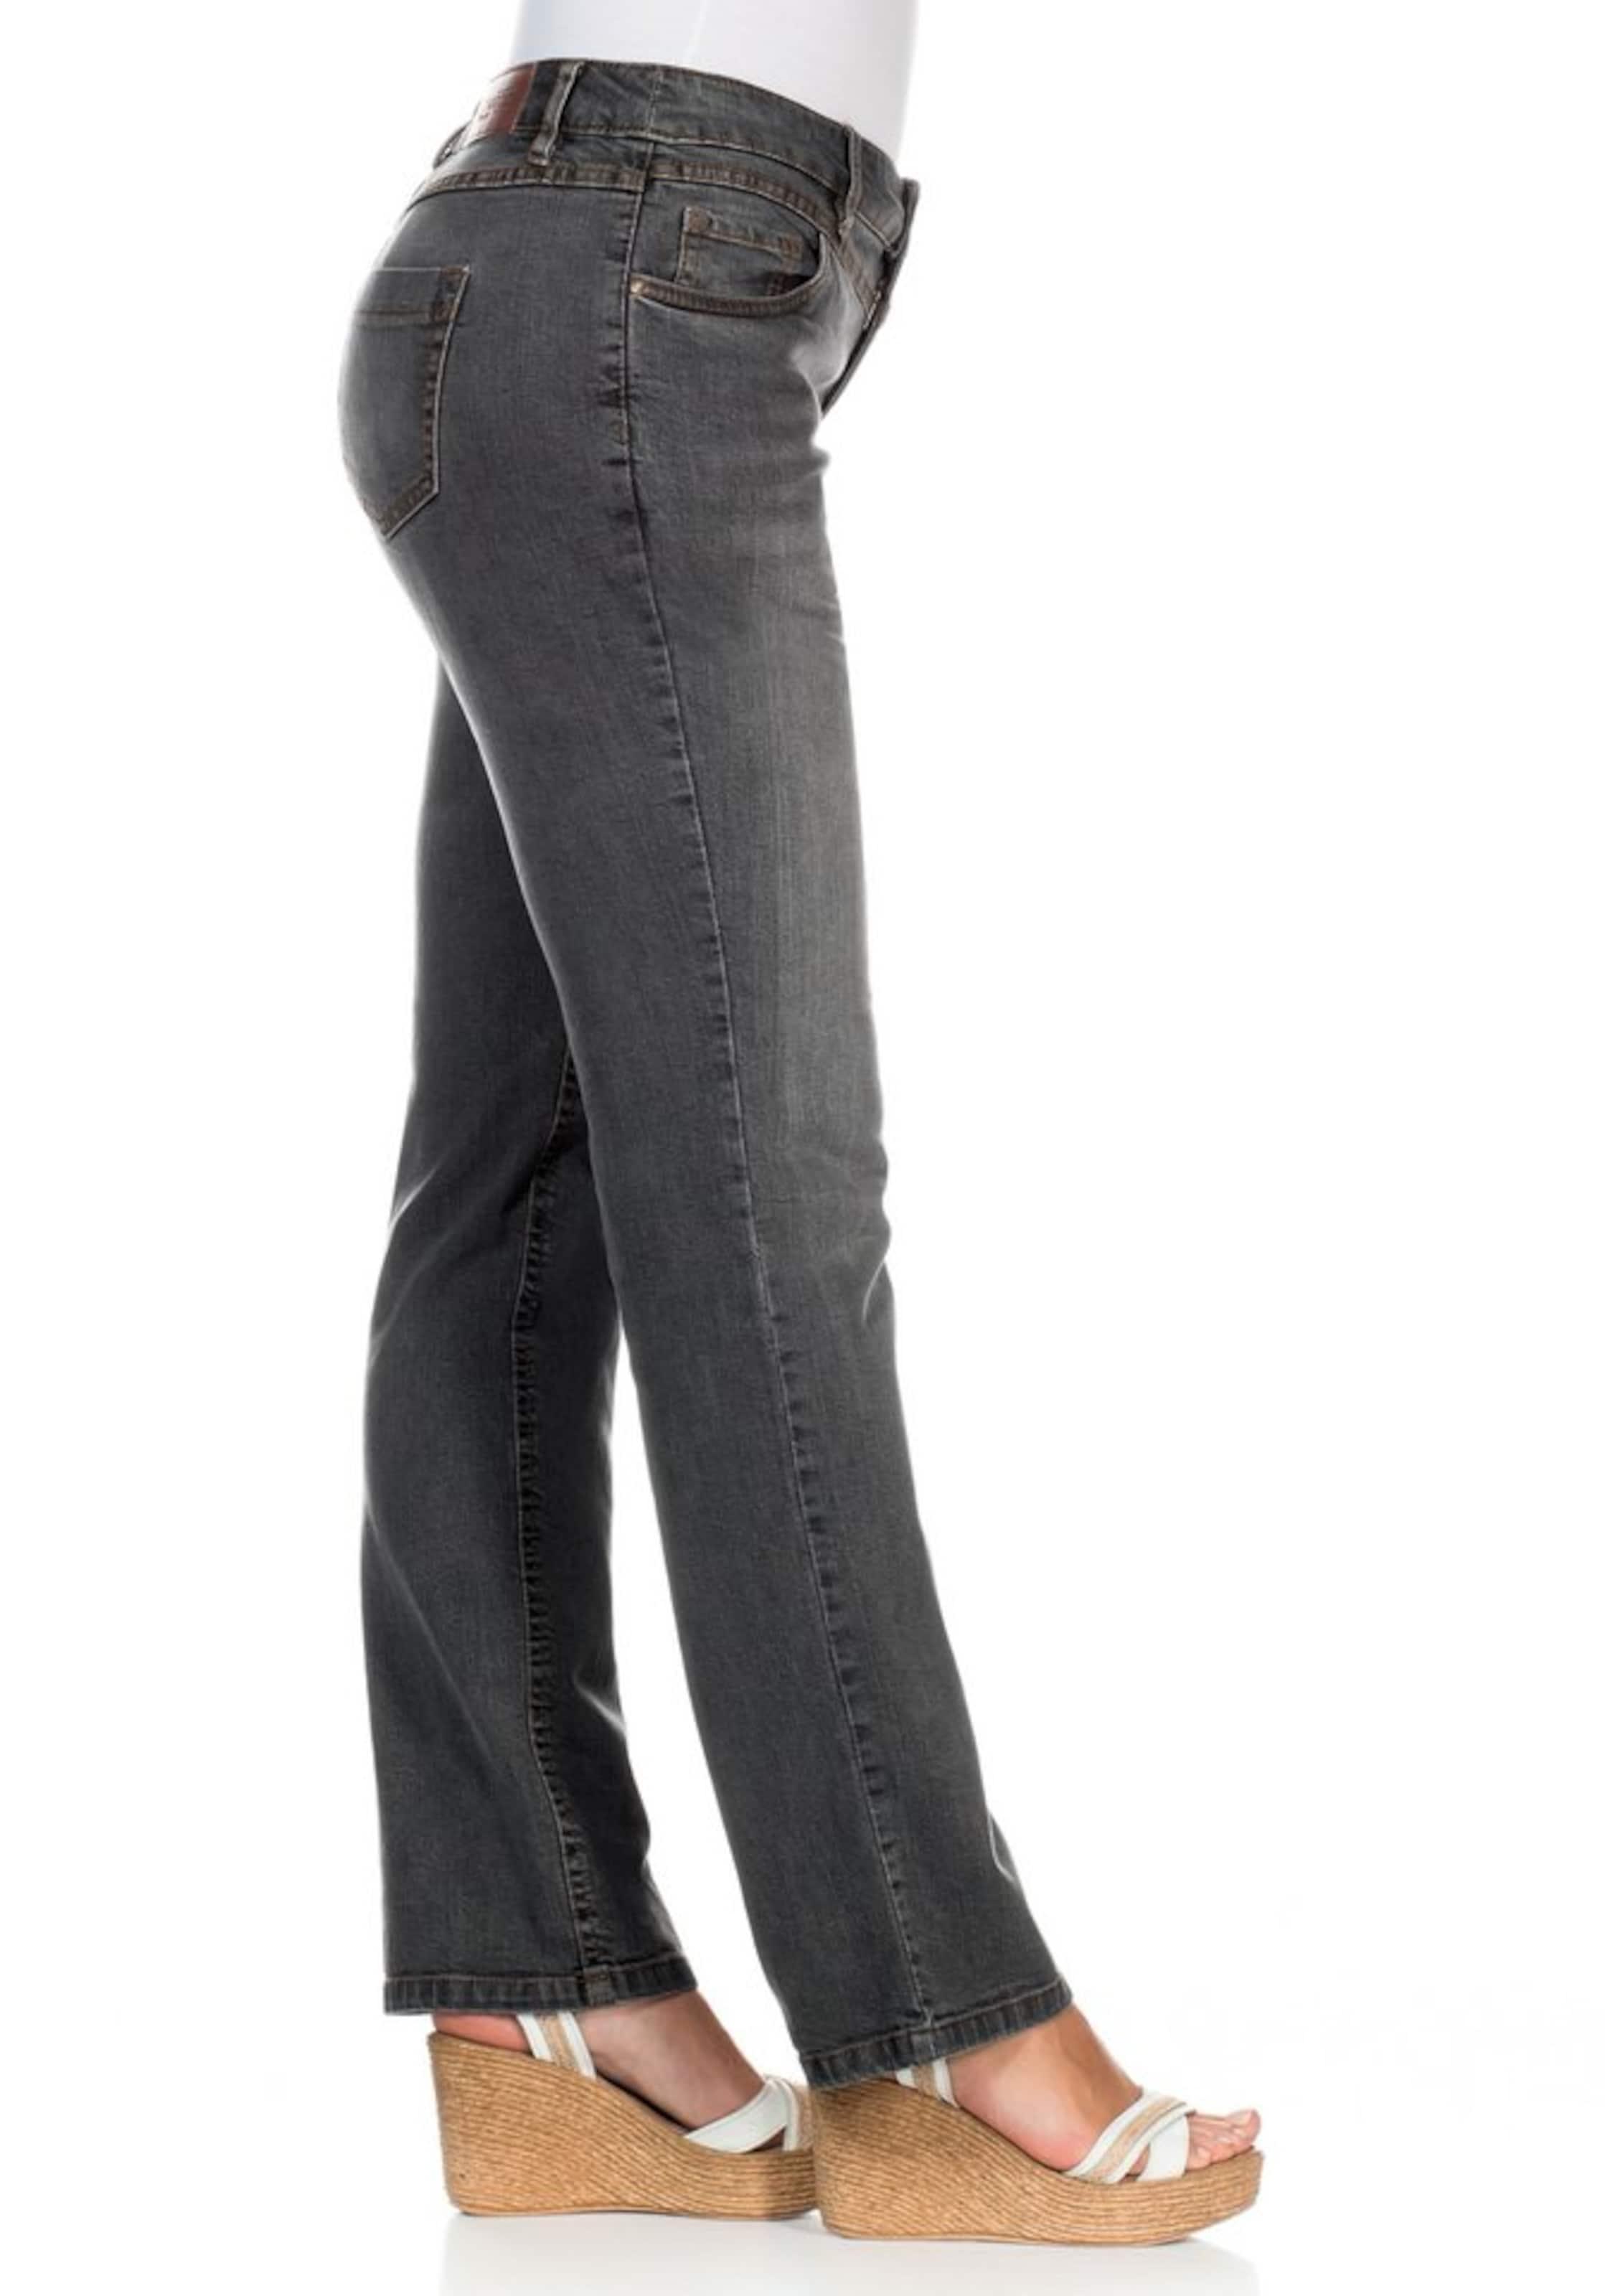 Schnitt jeans Geradem Sheego Stretch Grey Mit Denim In g7bfy6